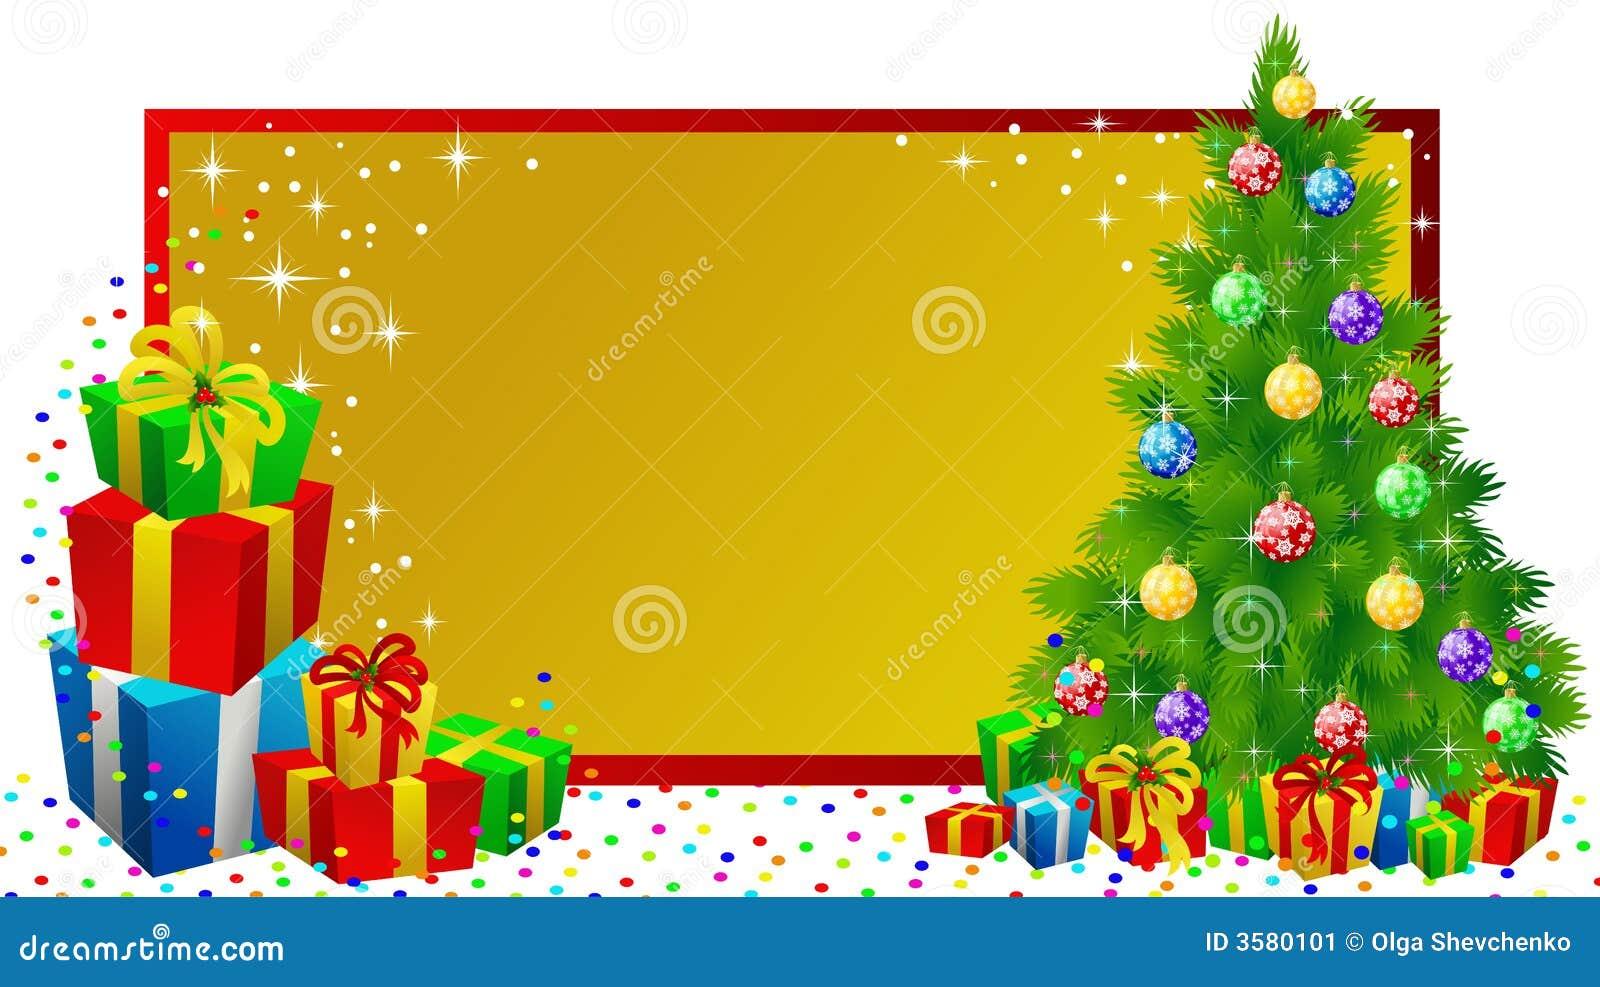 Christmas Label Gifts Stock Image - Image: 3580101